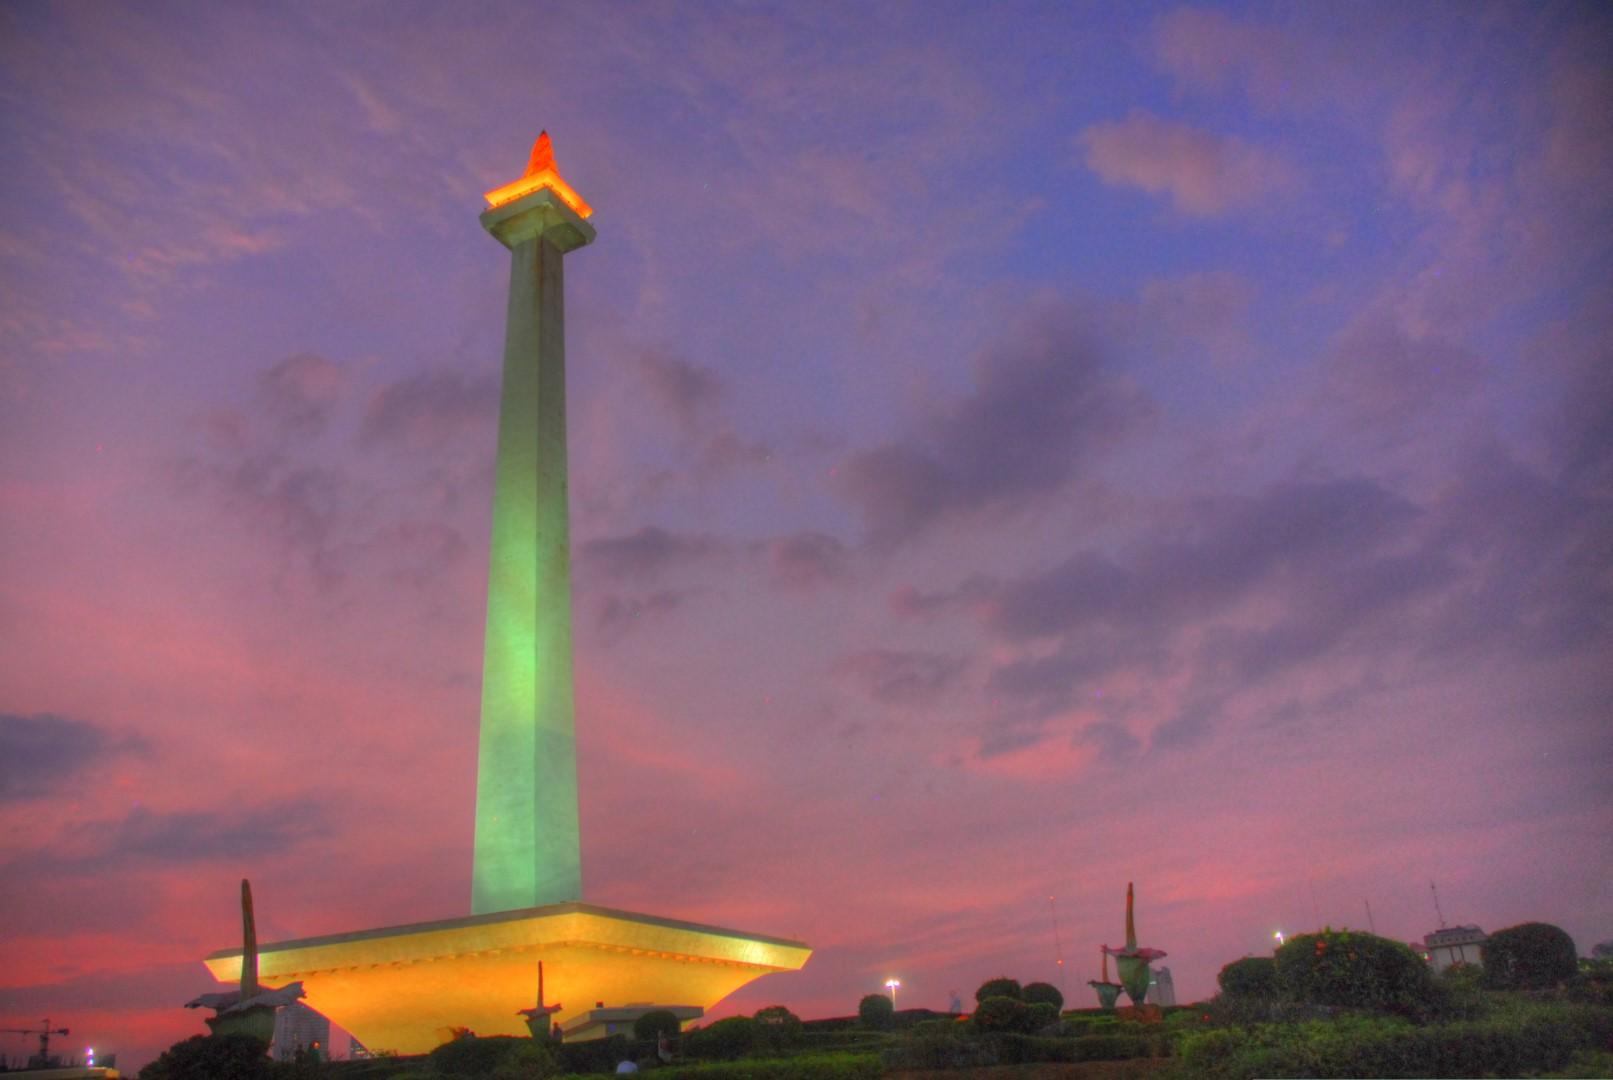 Pemindahan Ibu Kota:  Hapus Stigma 'Jawa Sentris' atau Pindahkan Persoalan